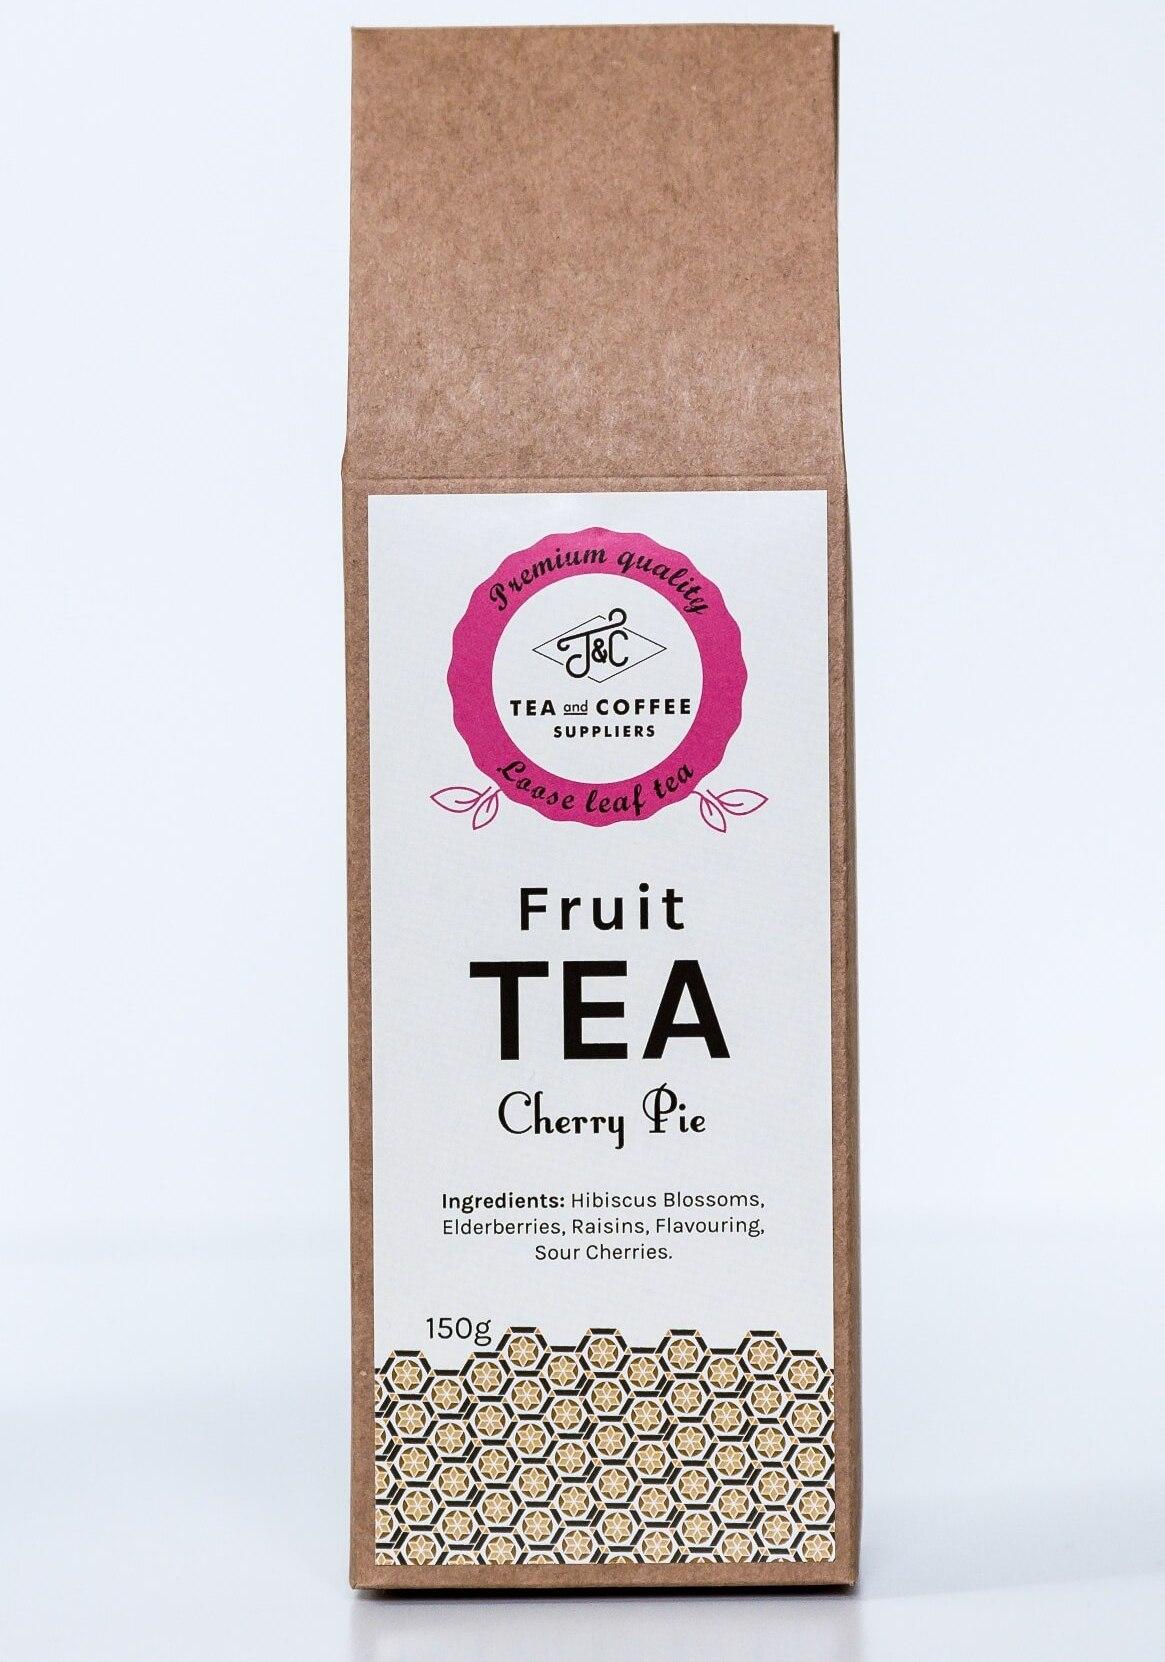 T&C Fruit Tea 'Cherry Pie'